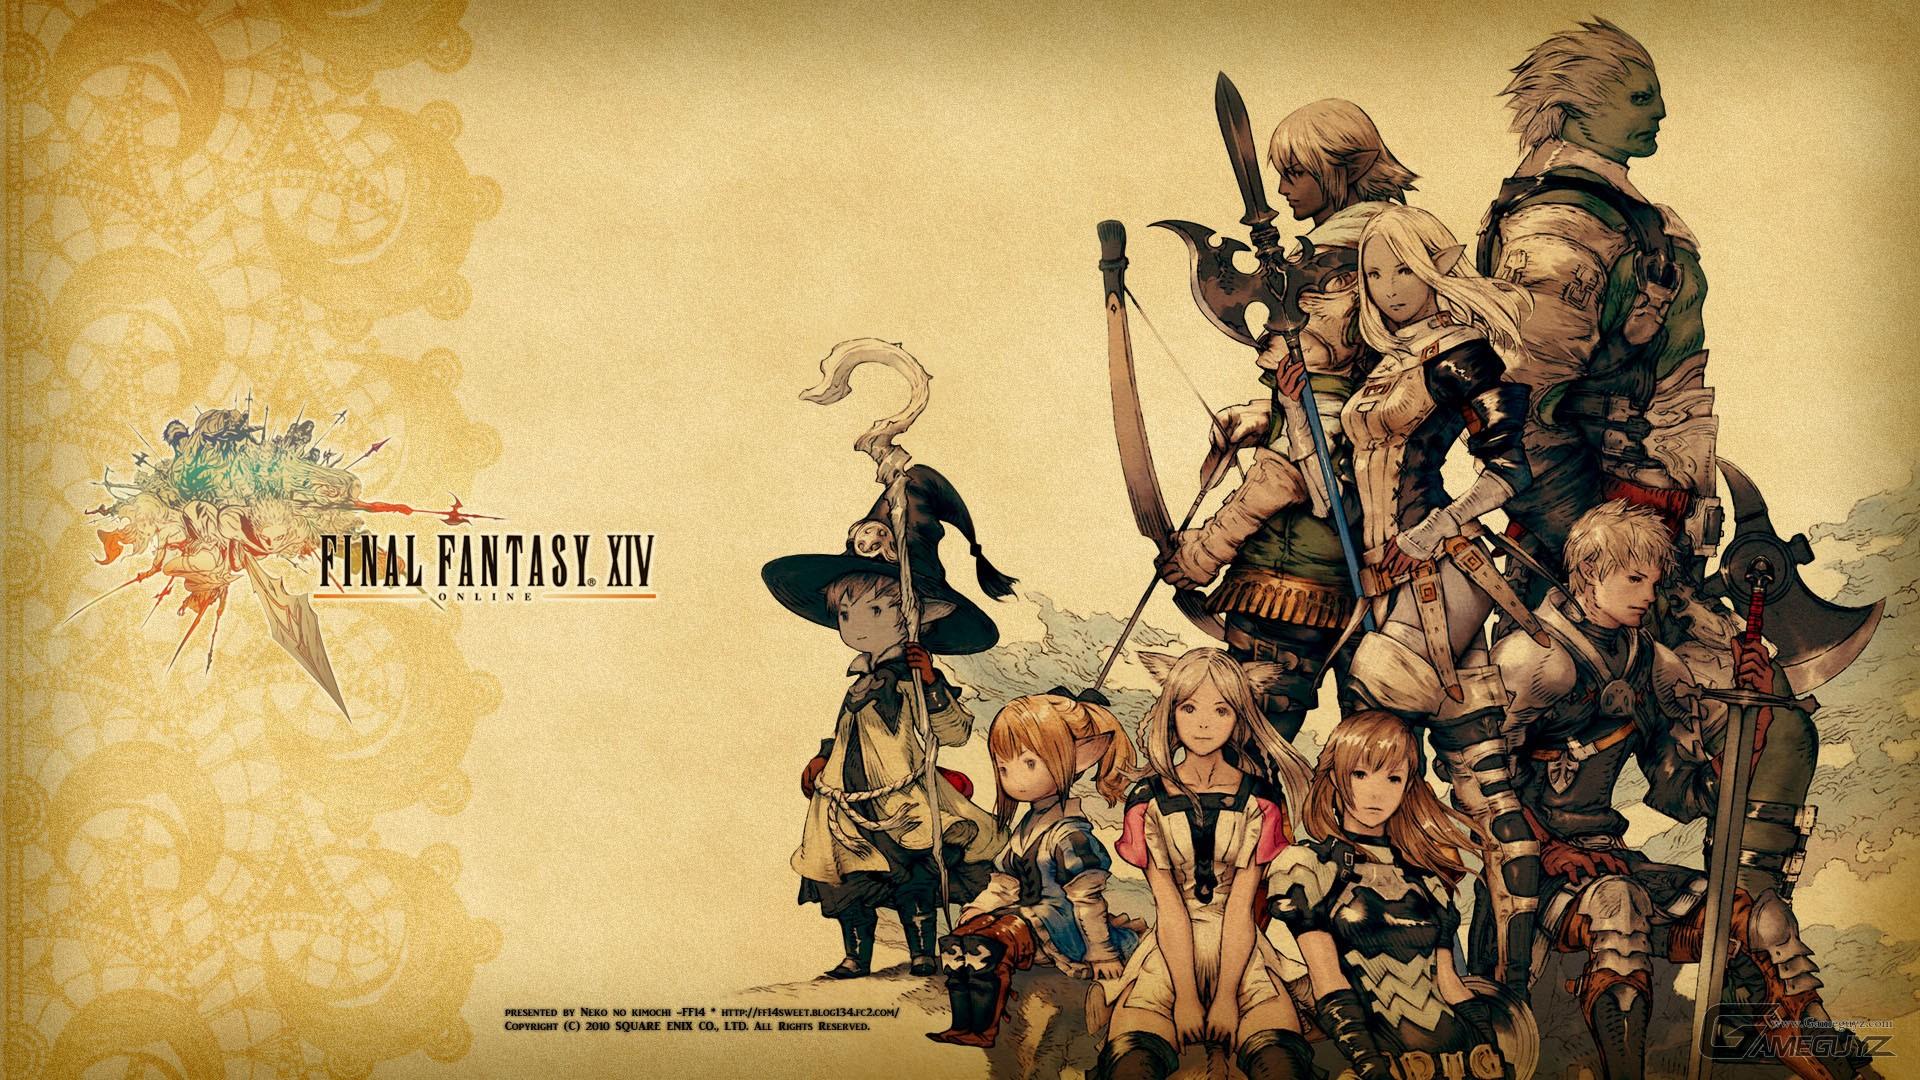 Final Fantasy Xiv Wallpaper Download Free Amazing Full Hd